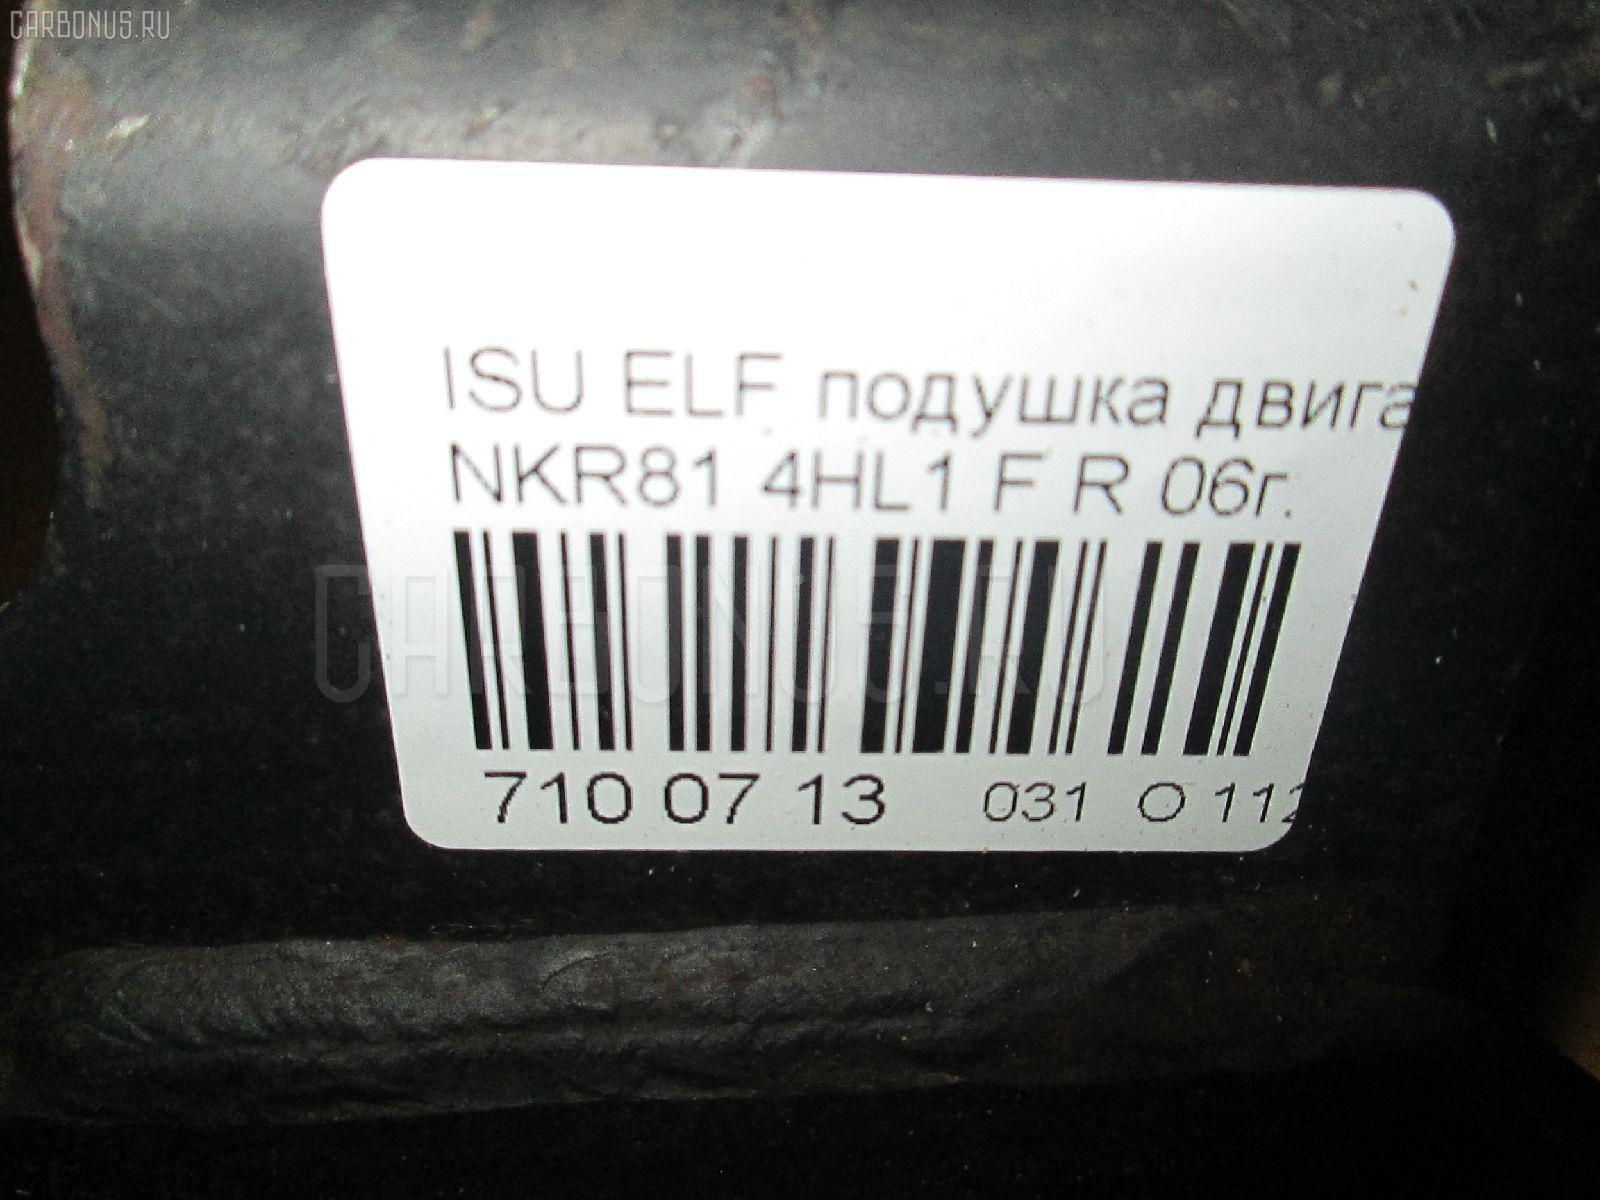 Подушка двигателя ISUZU ELF NKR81 4HL1 Фото 9